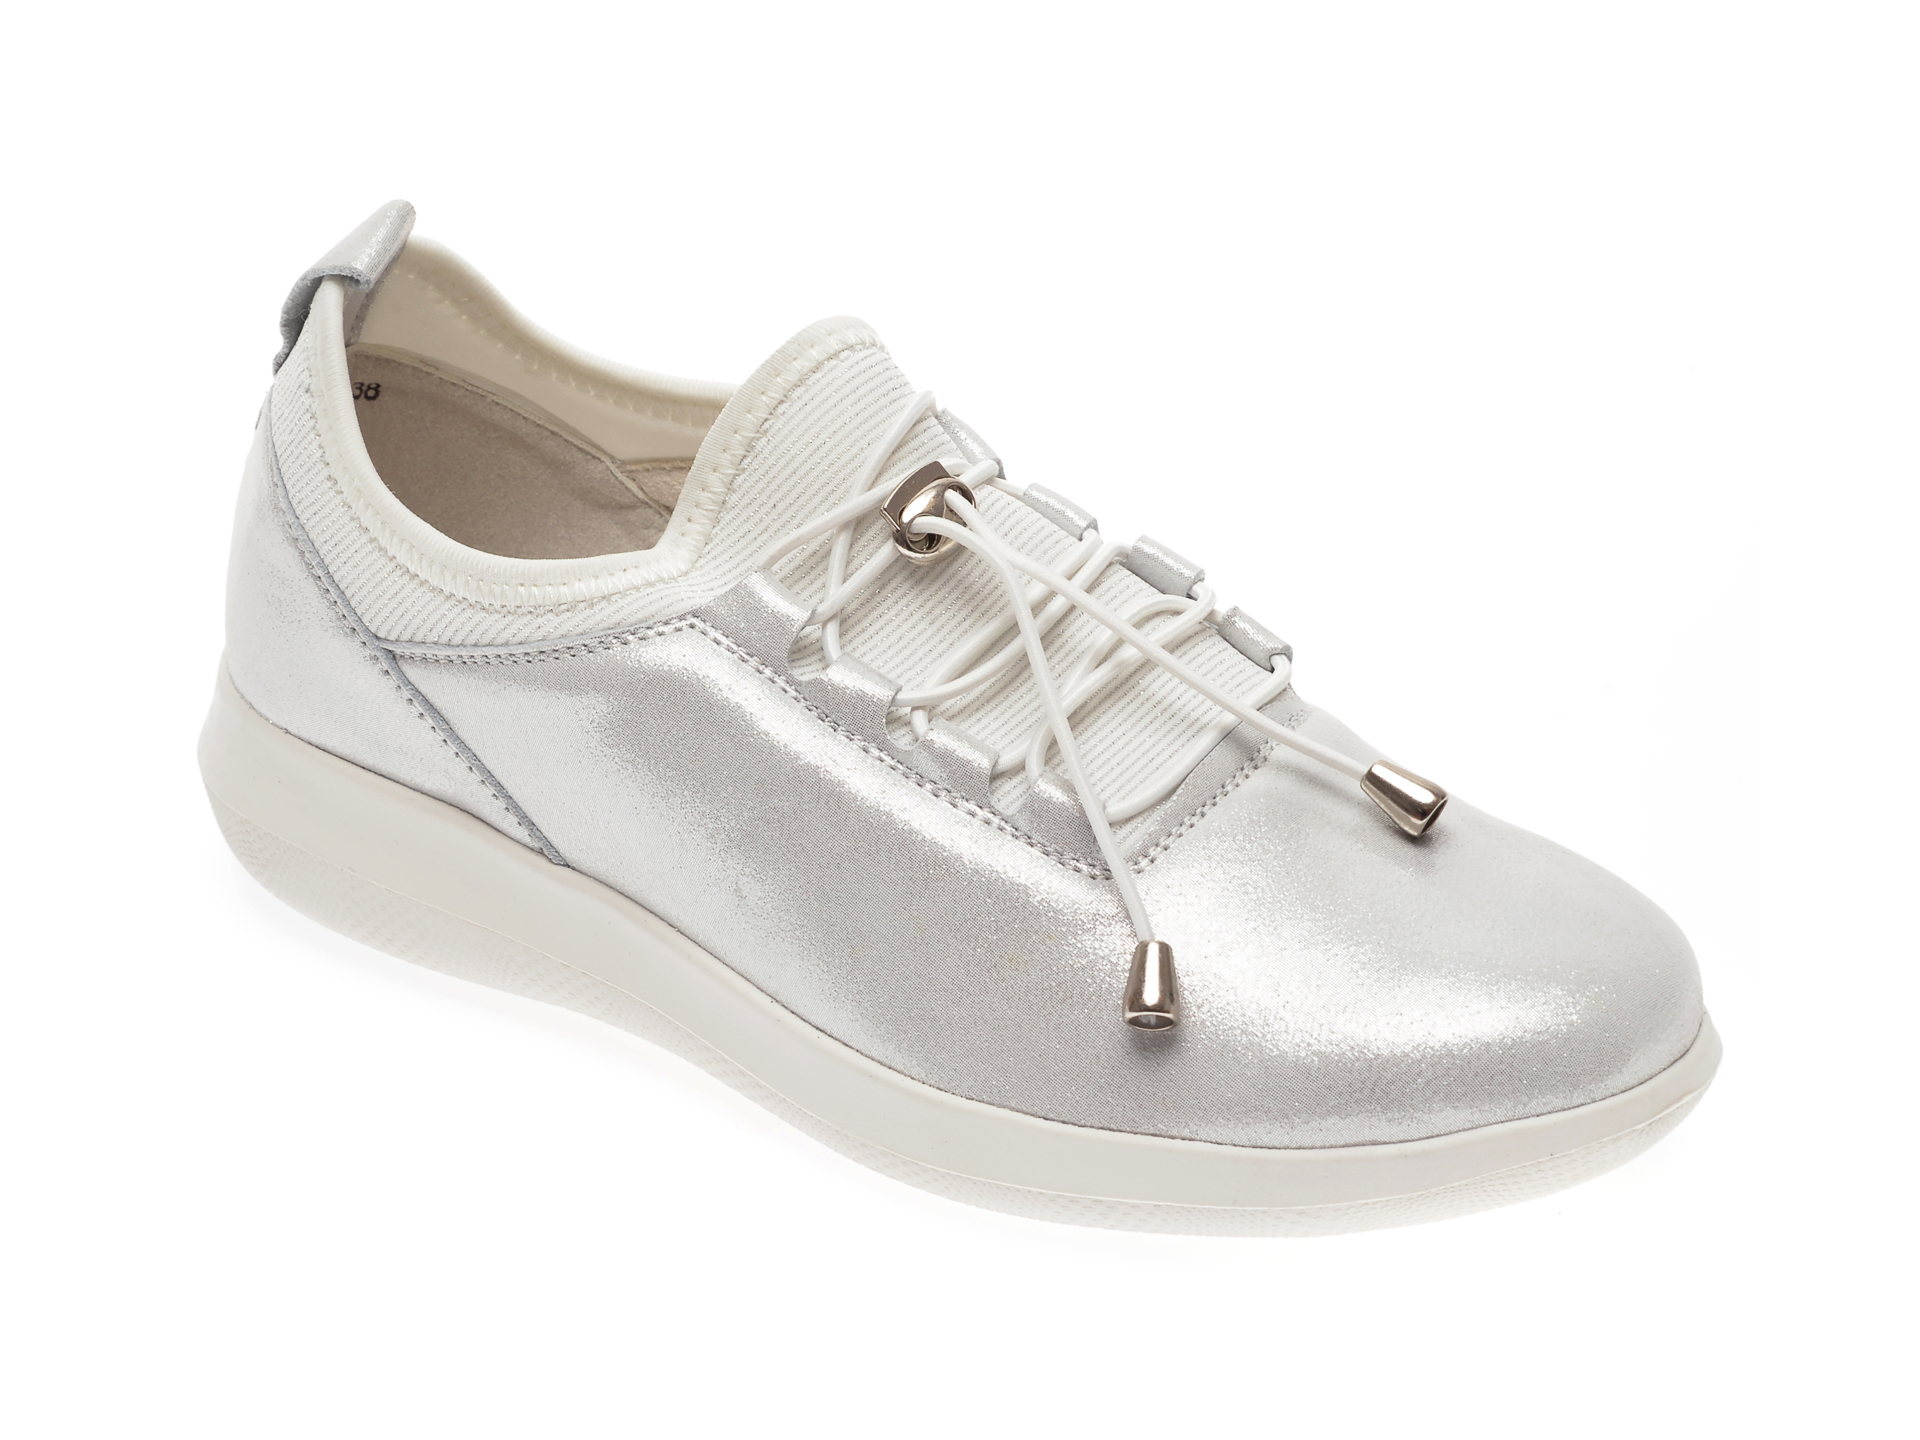 Pantofi IMAGE albi, 8595312, din piele naturala imagine